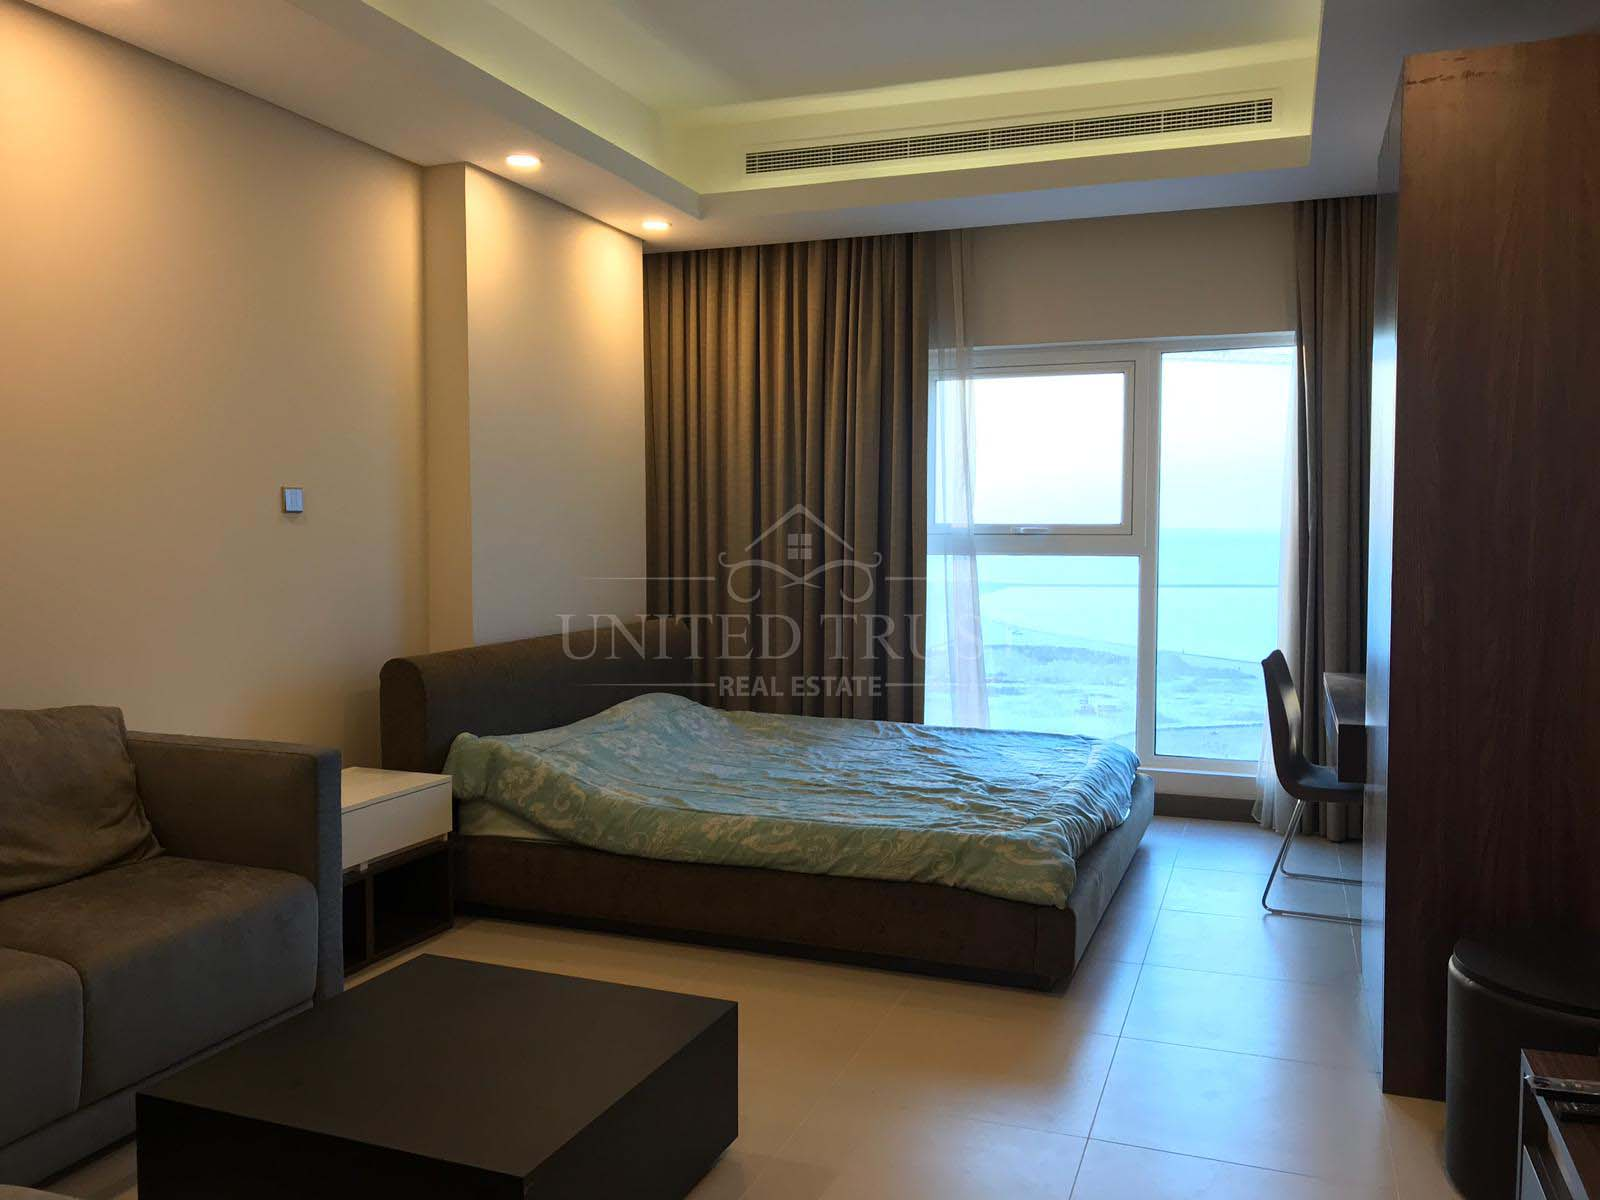 For Sale Apartment In Busaiteen Ref: BUS-SB-014